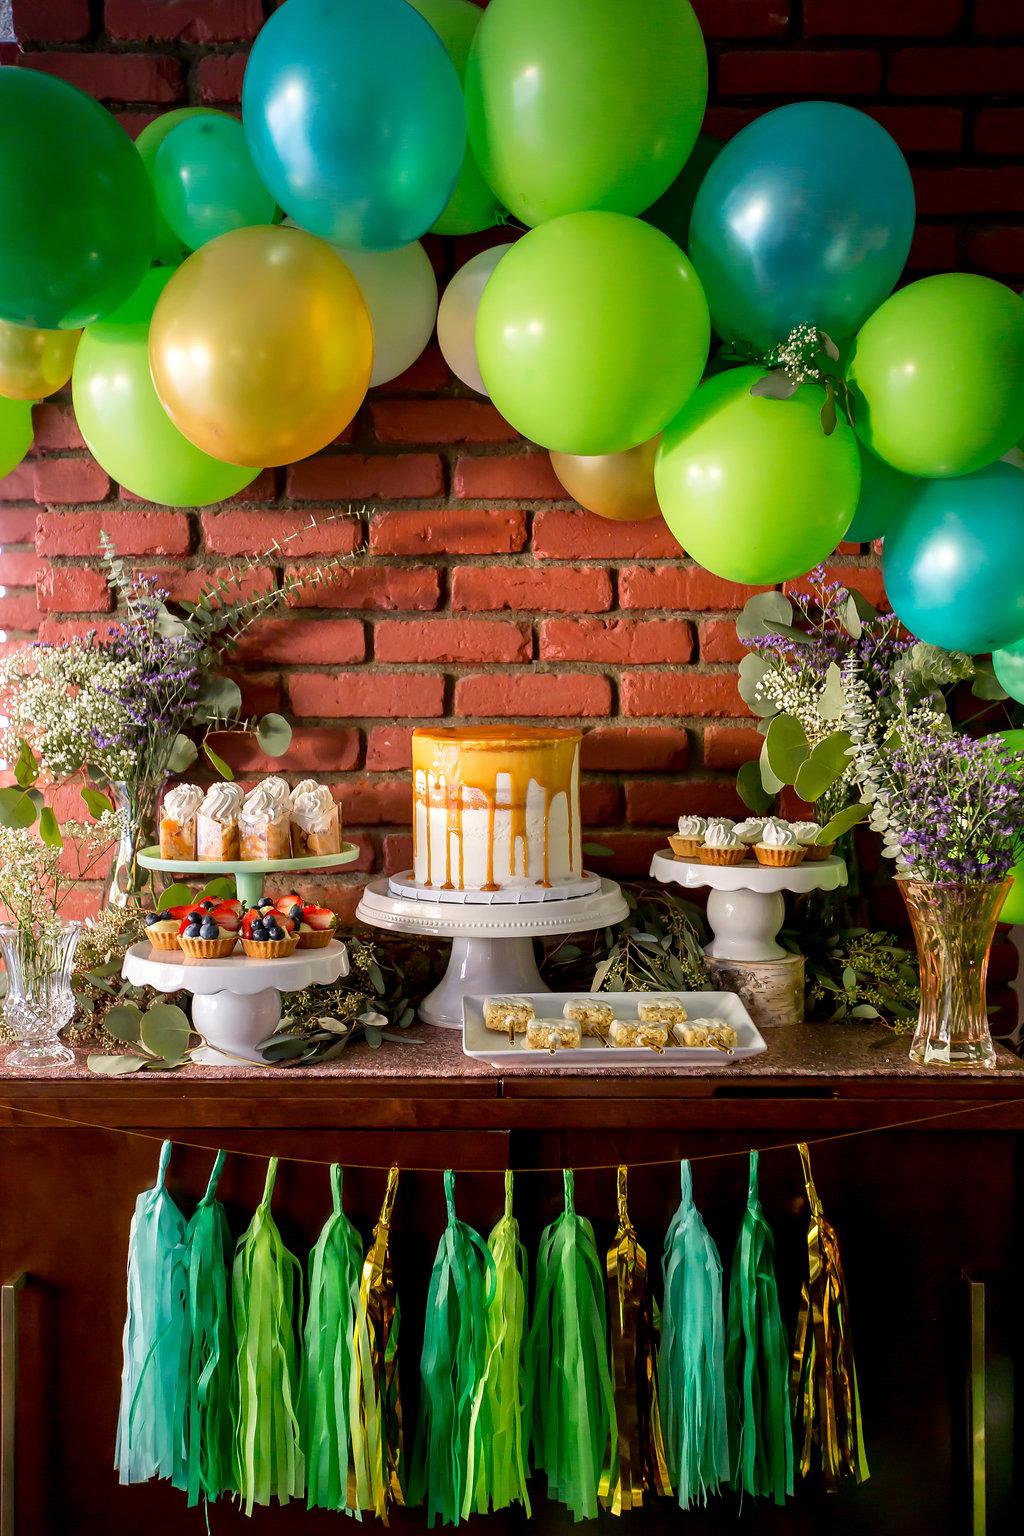 Baby Shower Dessert Table : shower, dessert, table, Shower, Lifestyle, Mwokaji, Cakery